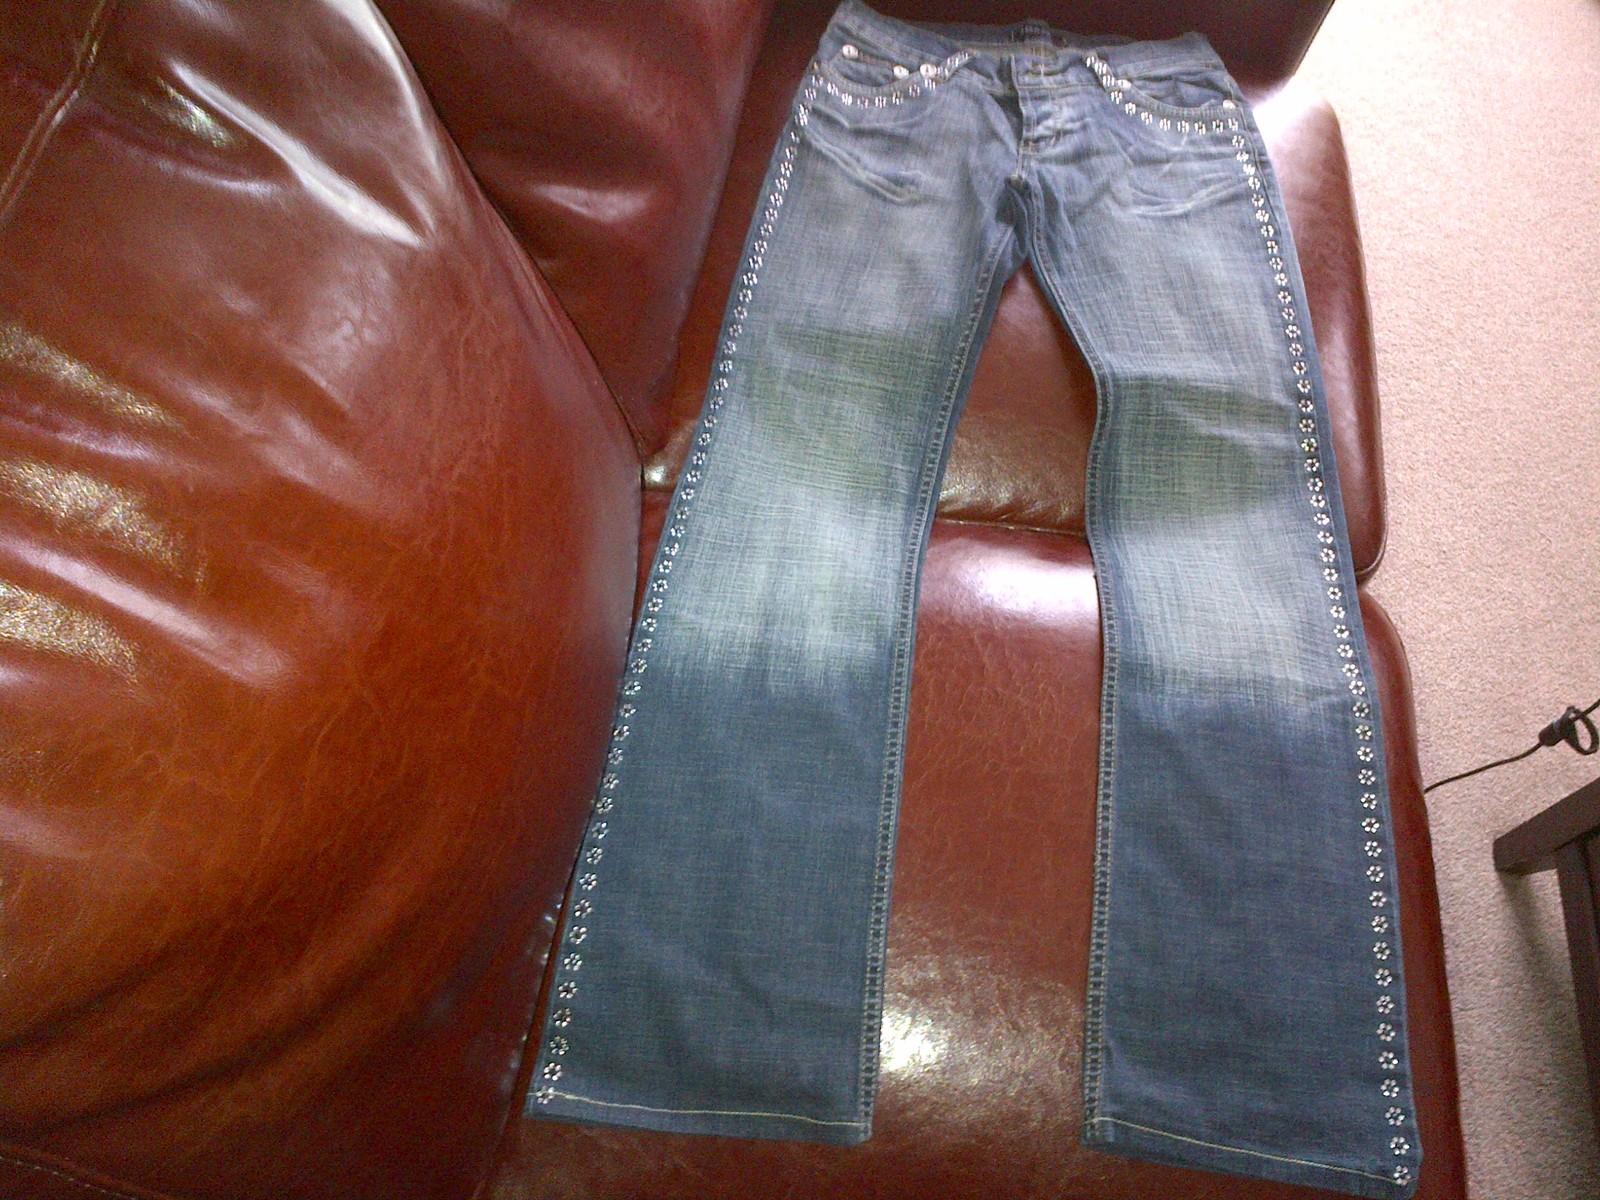 D&G denim elastic jeans trousers crystal flowers lines size 28 - $130.00